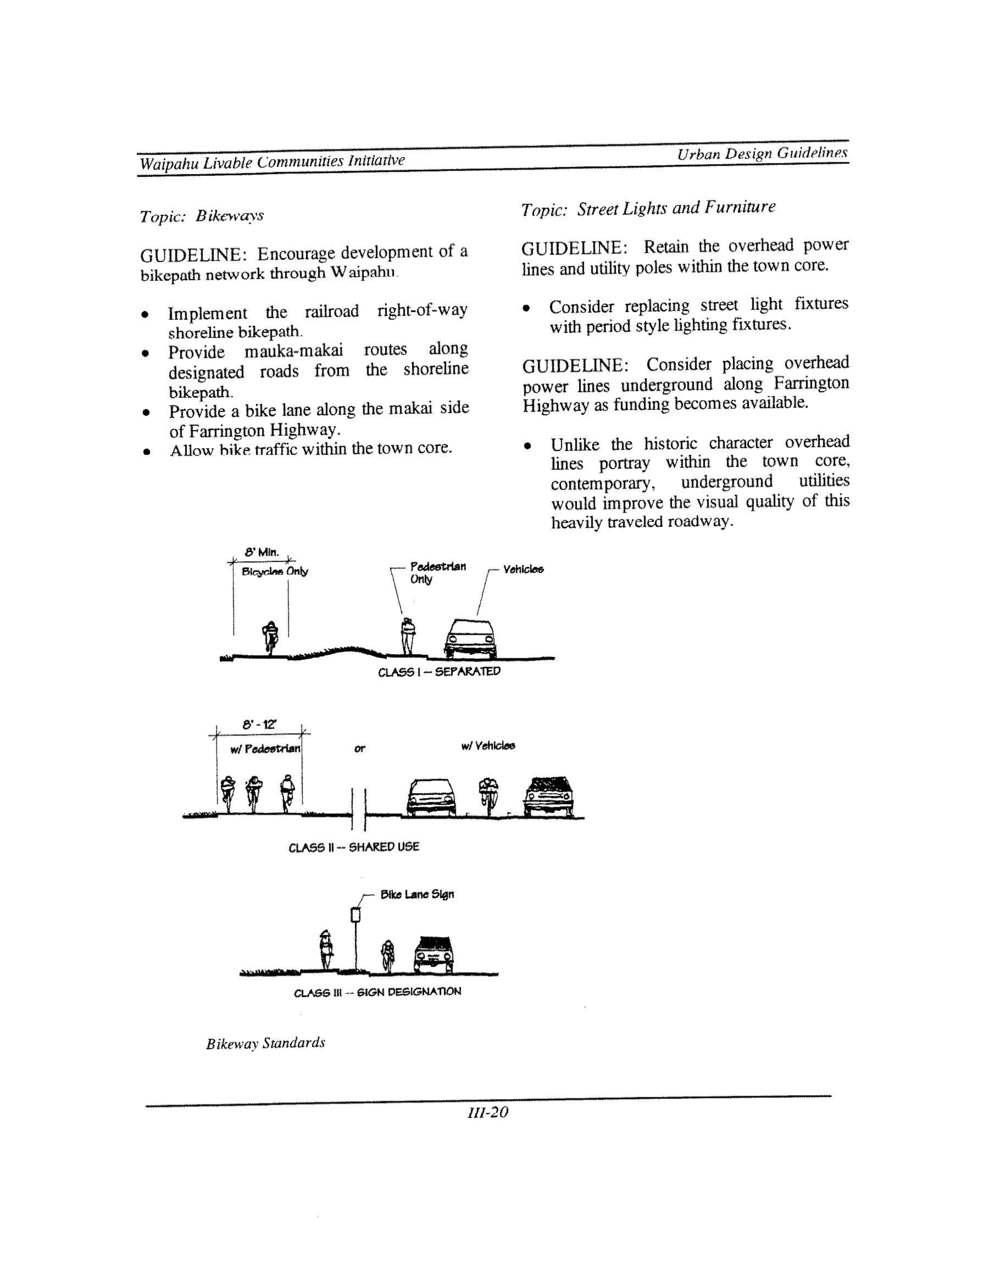 160531_WaipahuLivableCommunities(1998)_Page_110.jpg